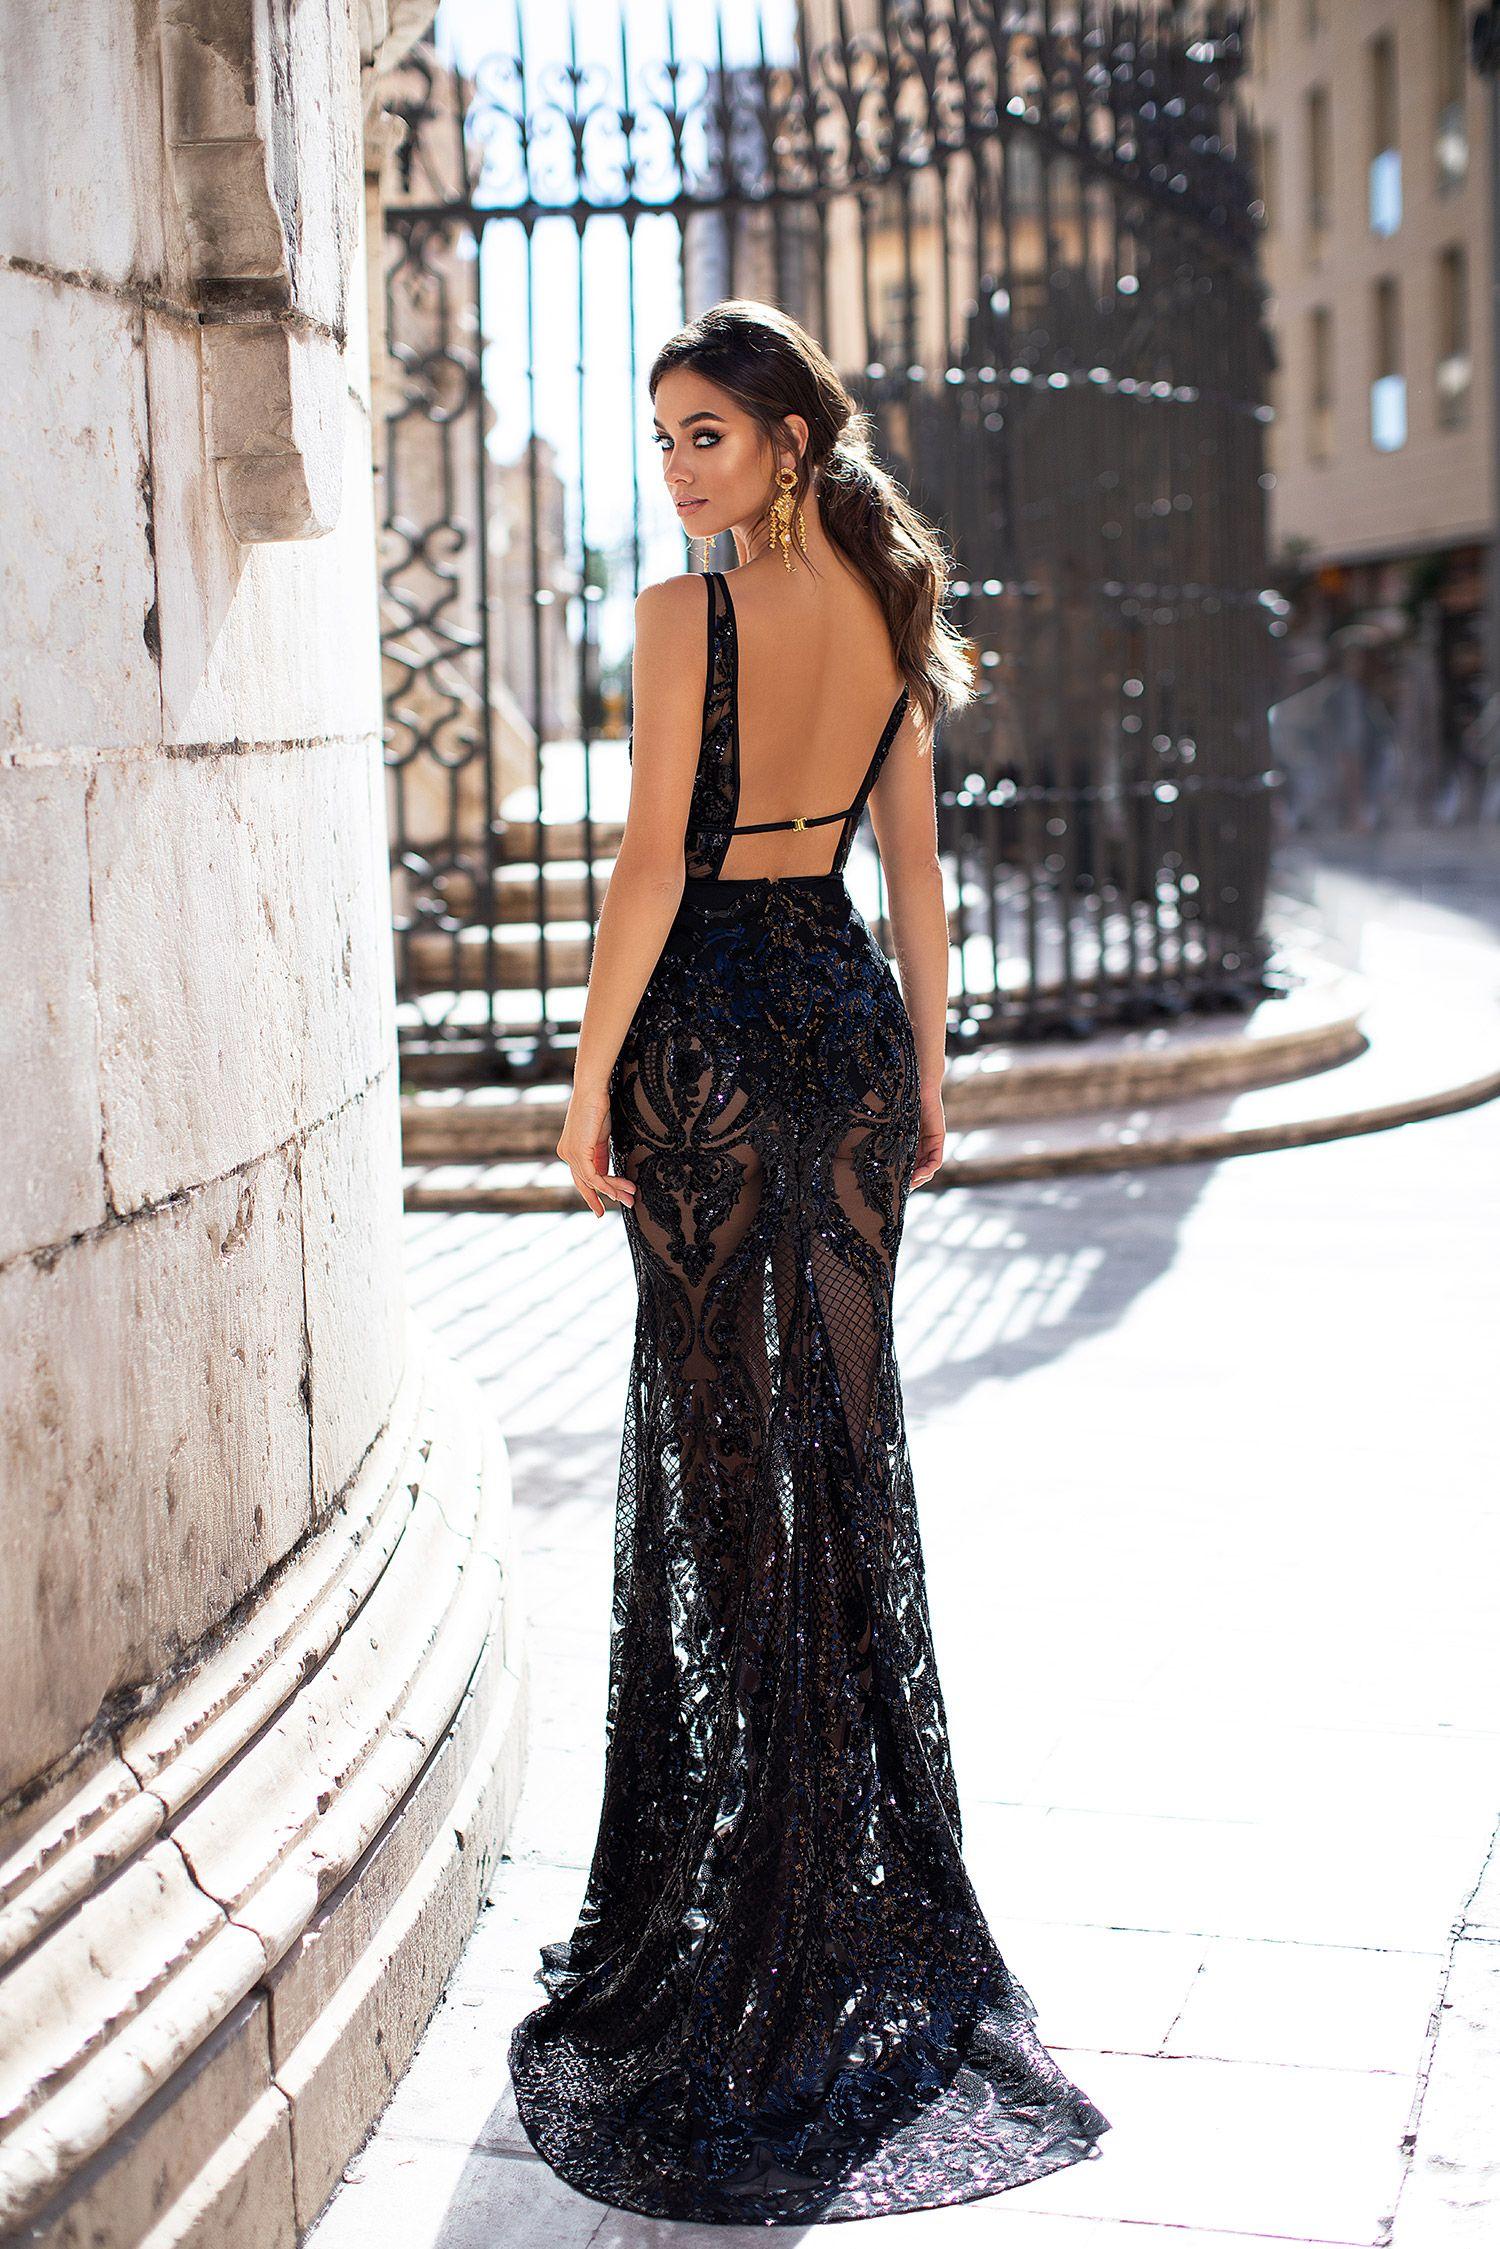 Black Sheer Sequin Prom Formal Evening Dress Black Sequin Dress Classy Dress Backless Dress Formal